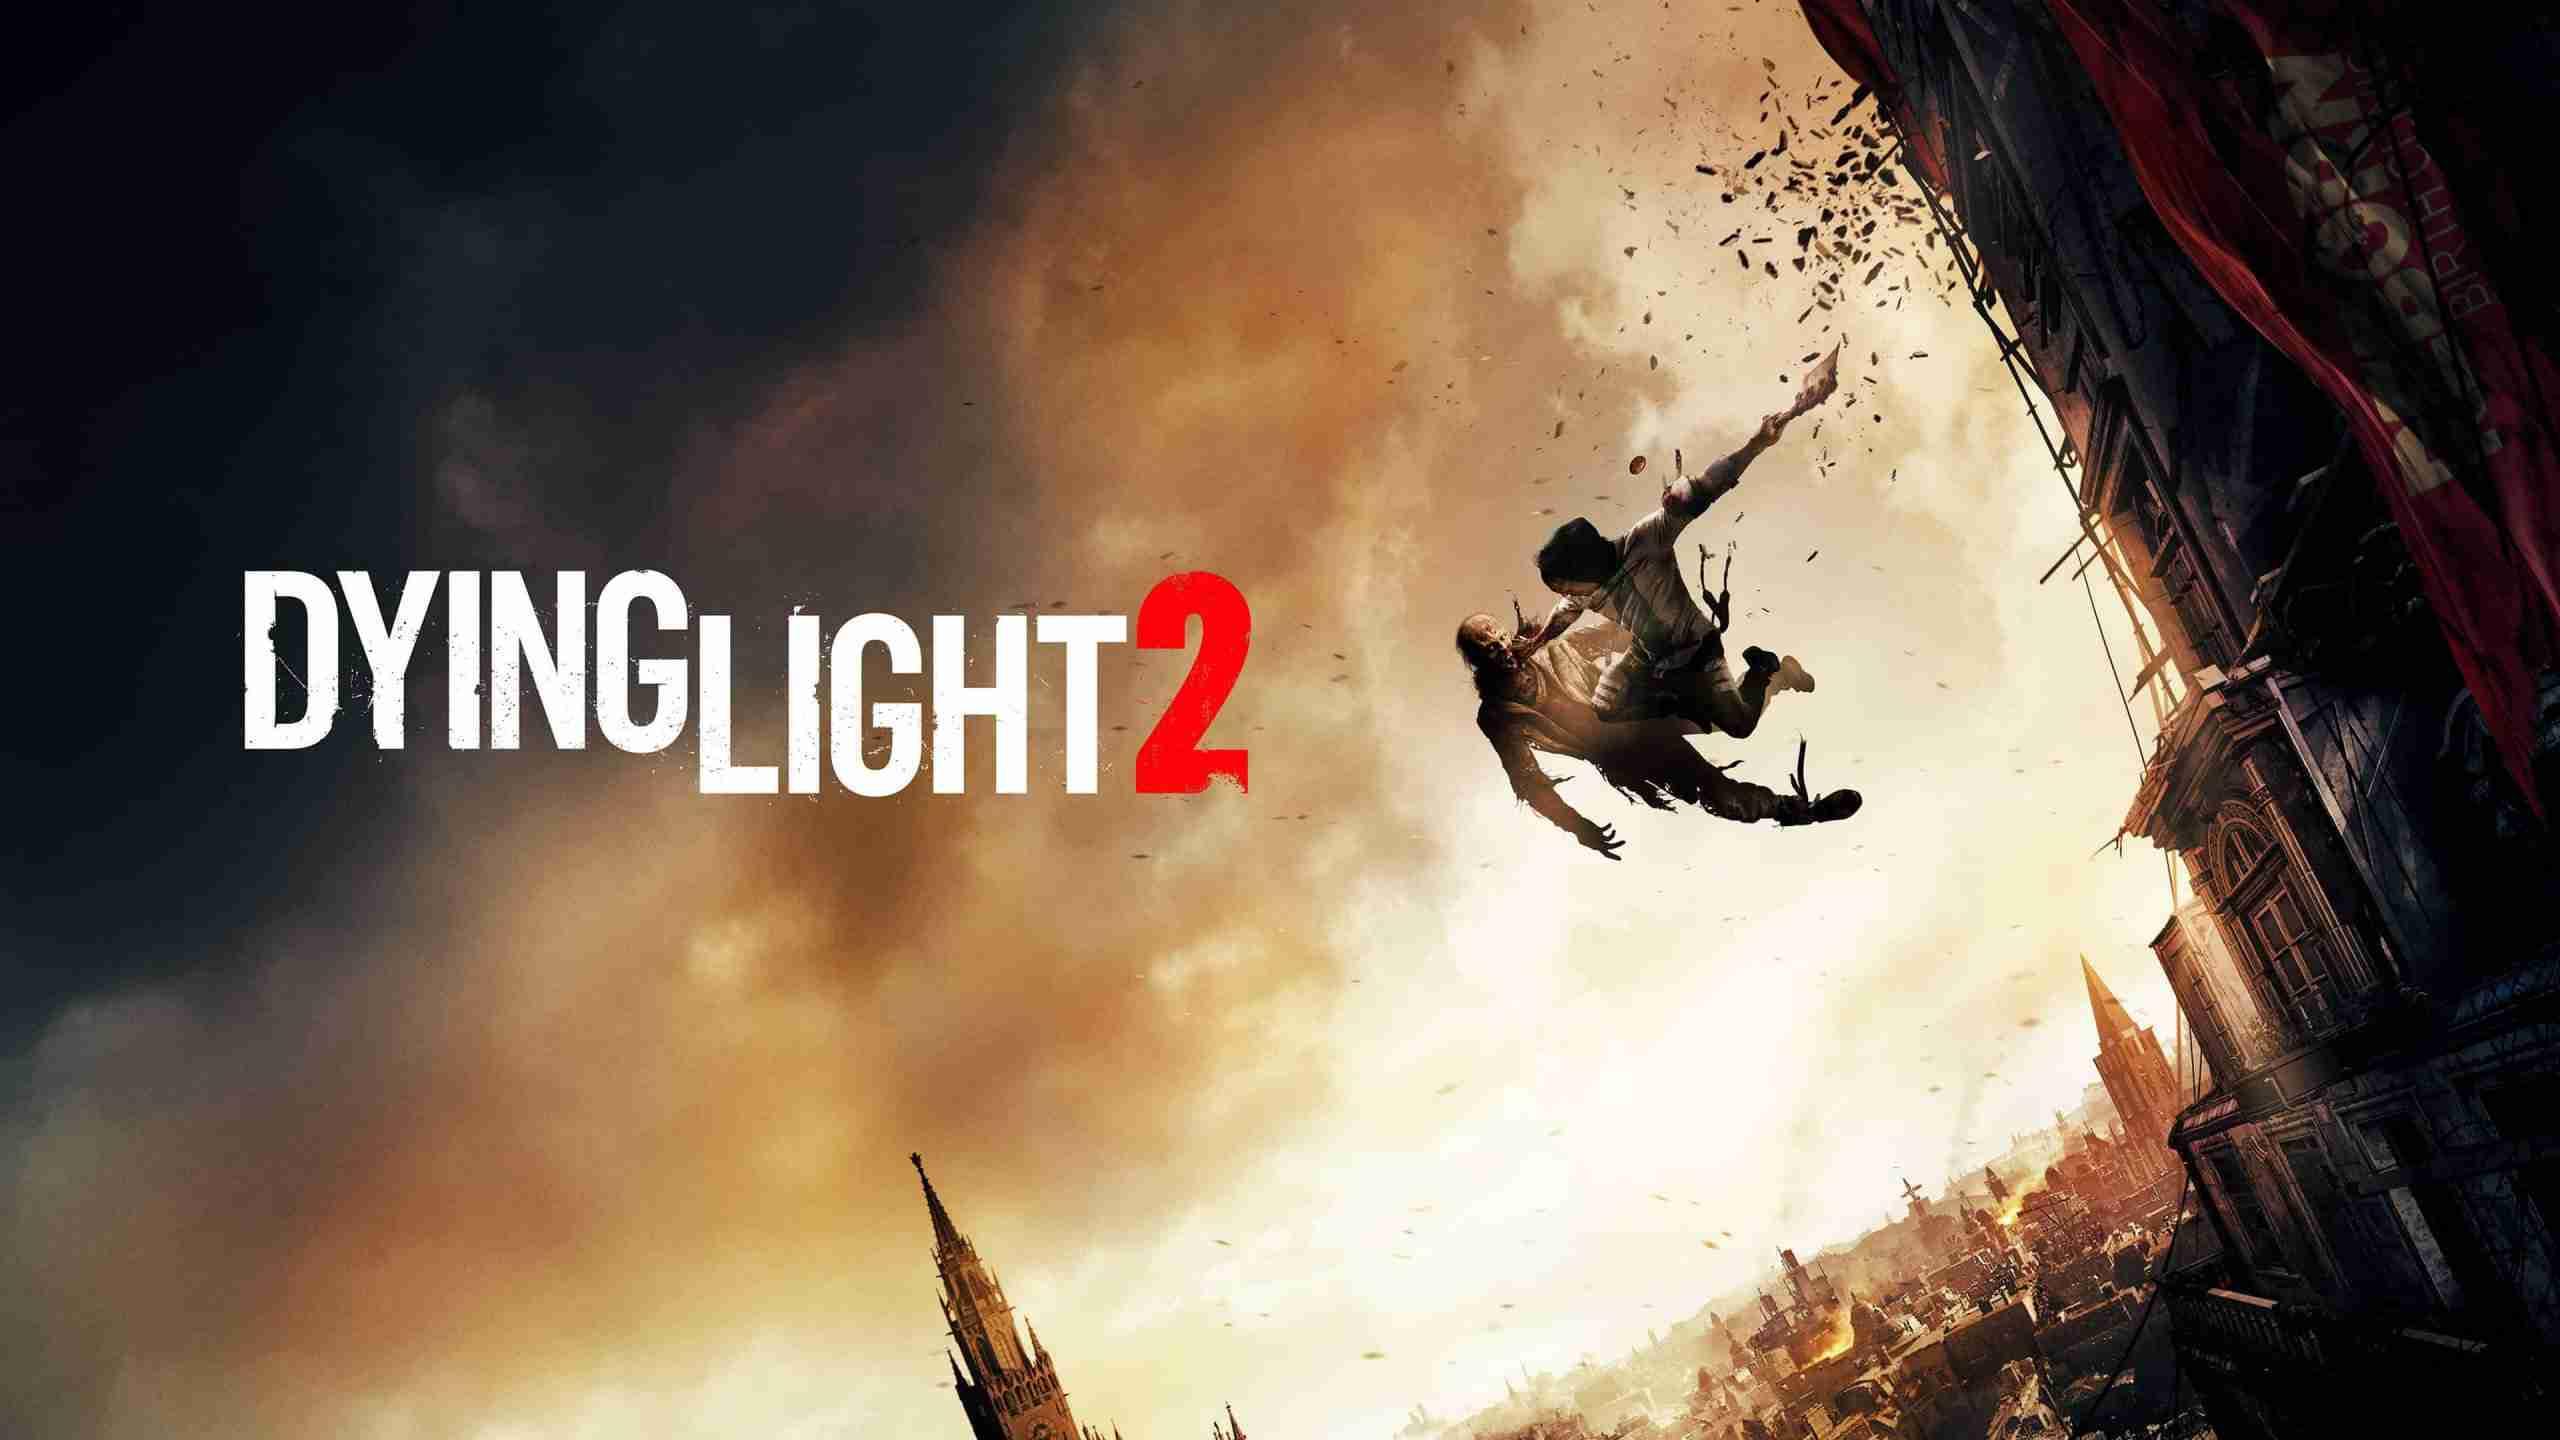 Dying Light 2 Update